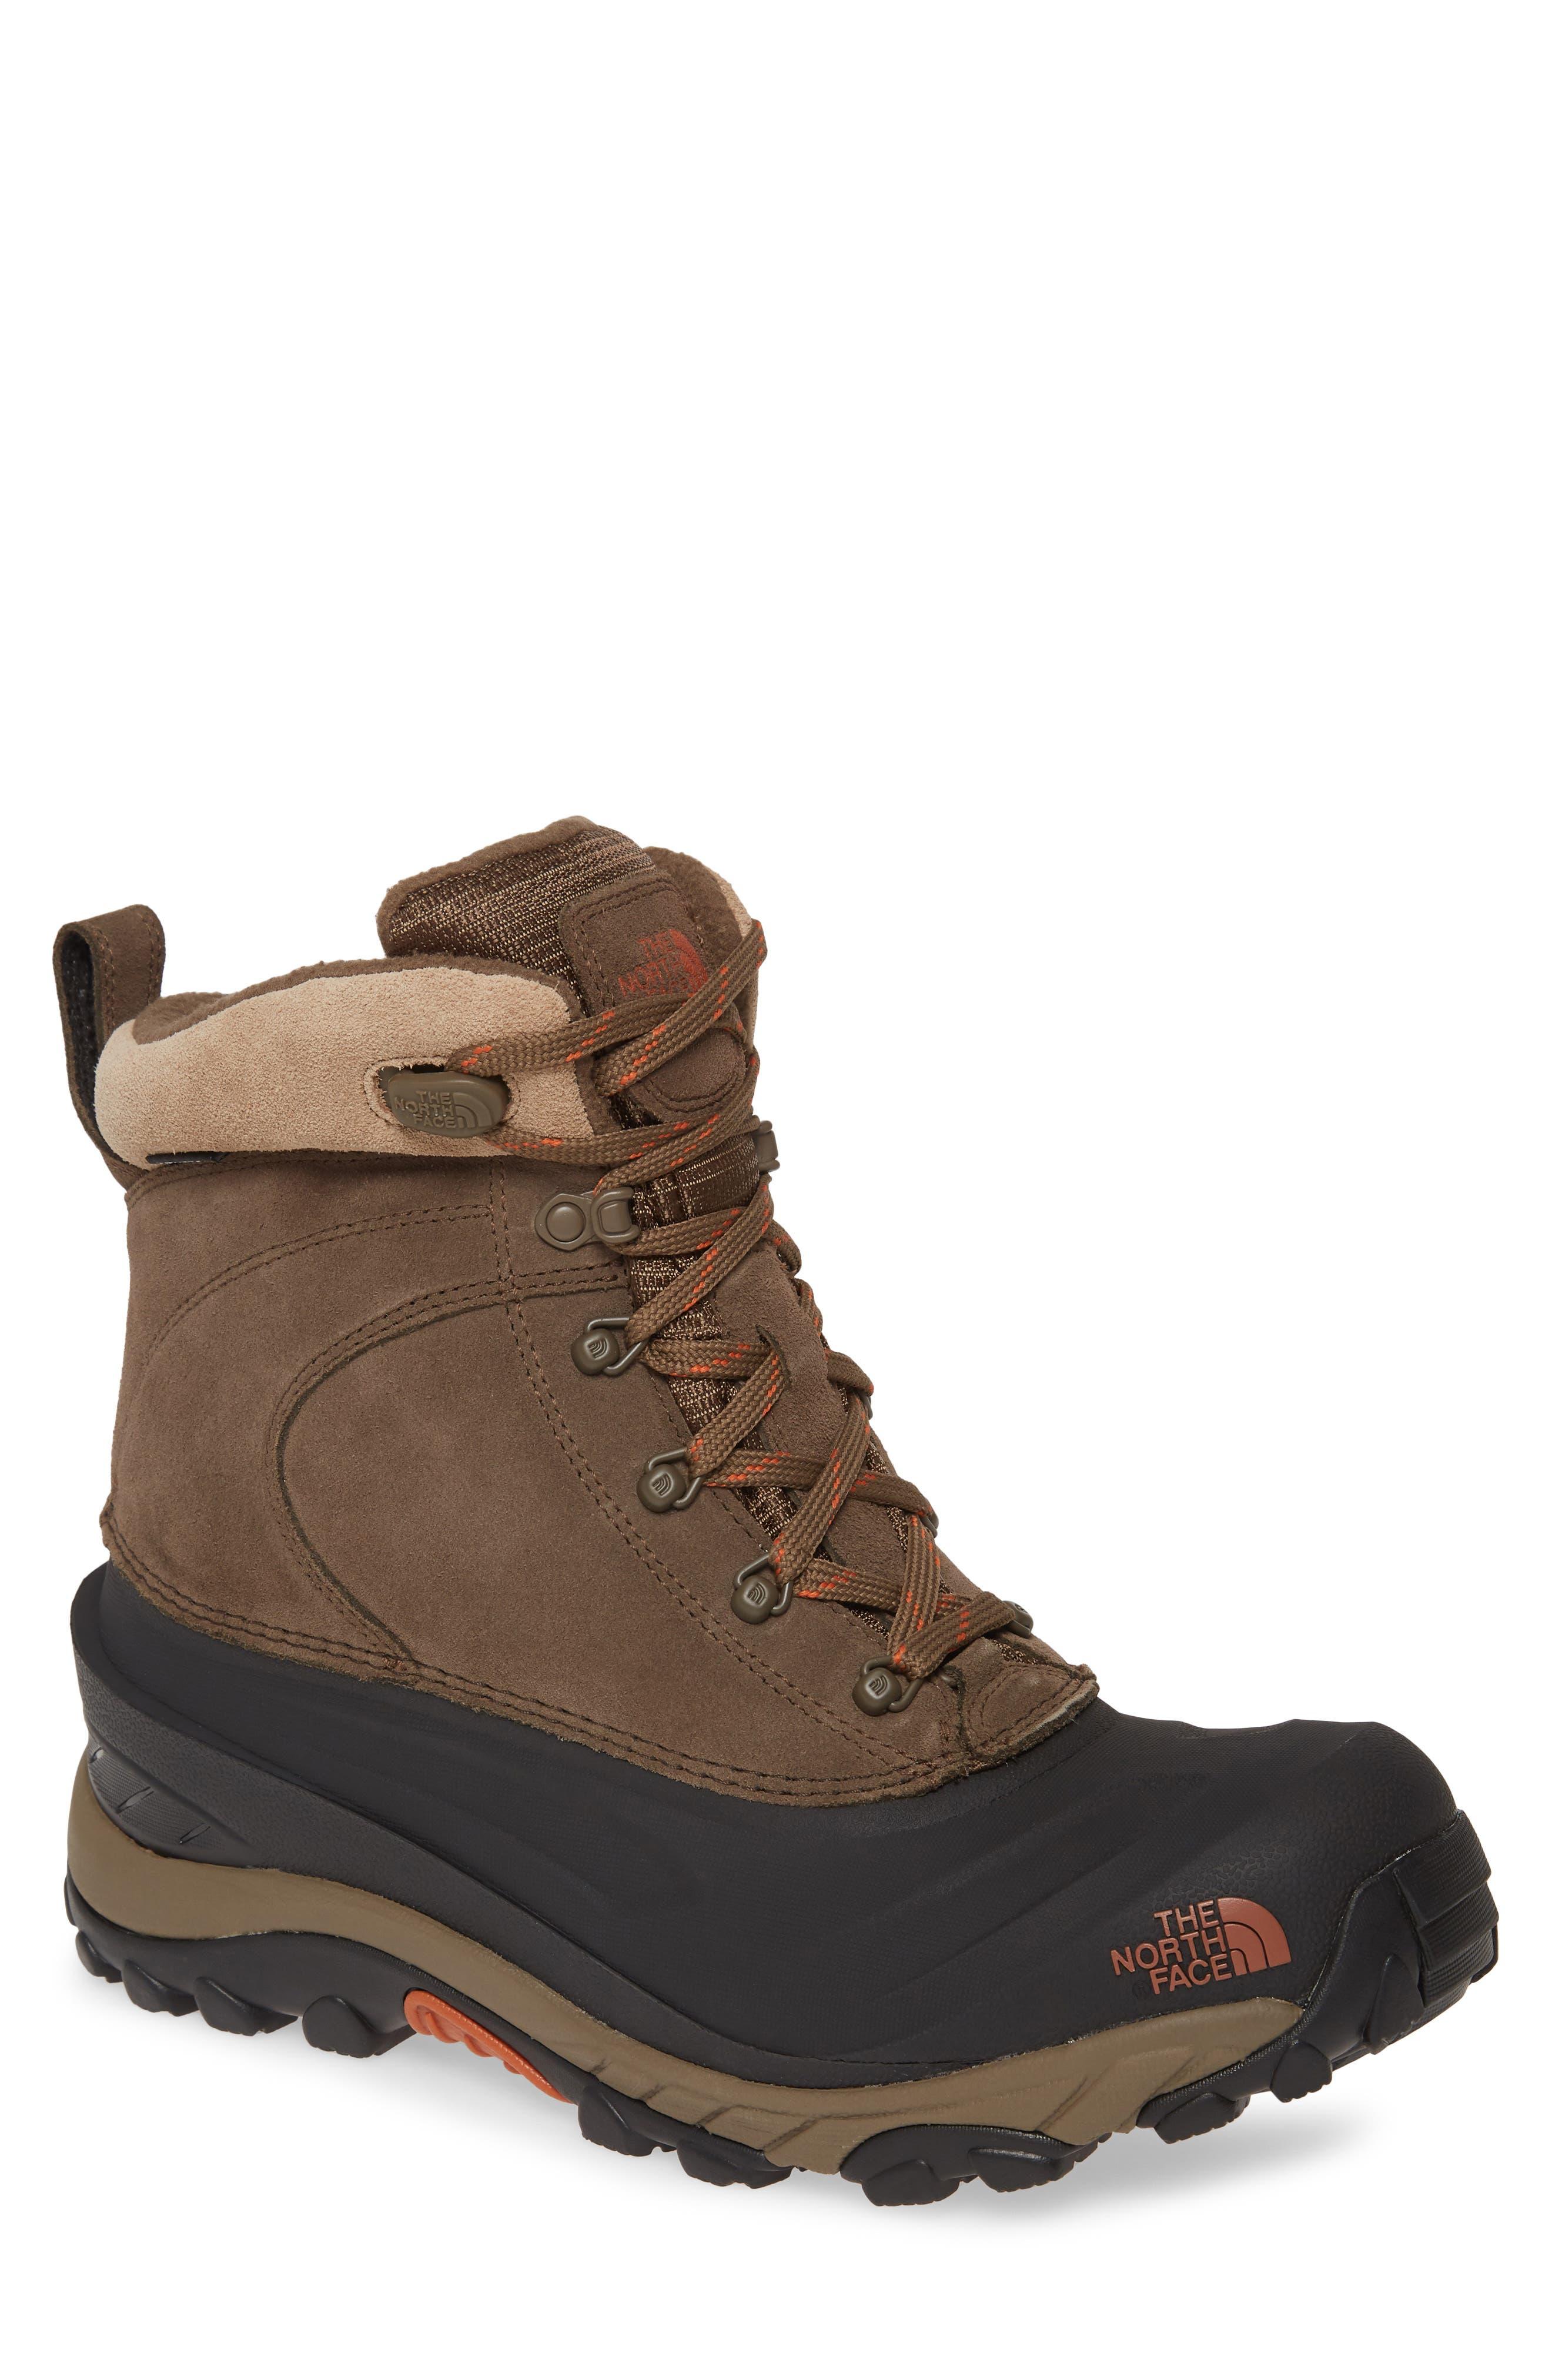 d6907c84b54 warm boots | Nordstrom